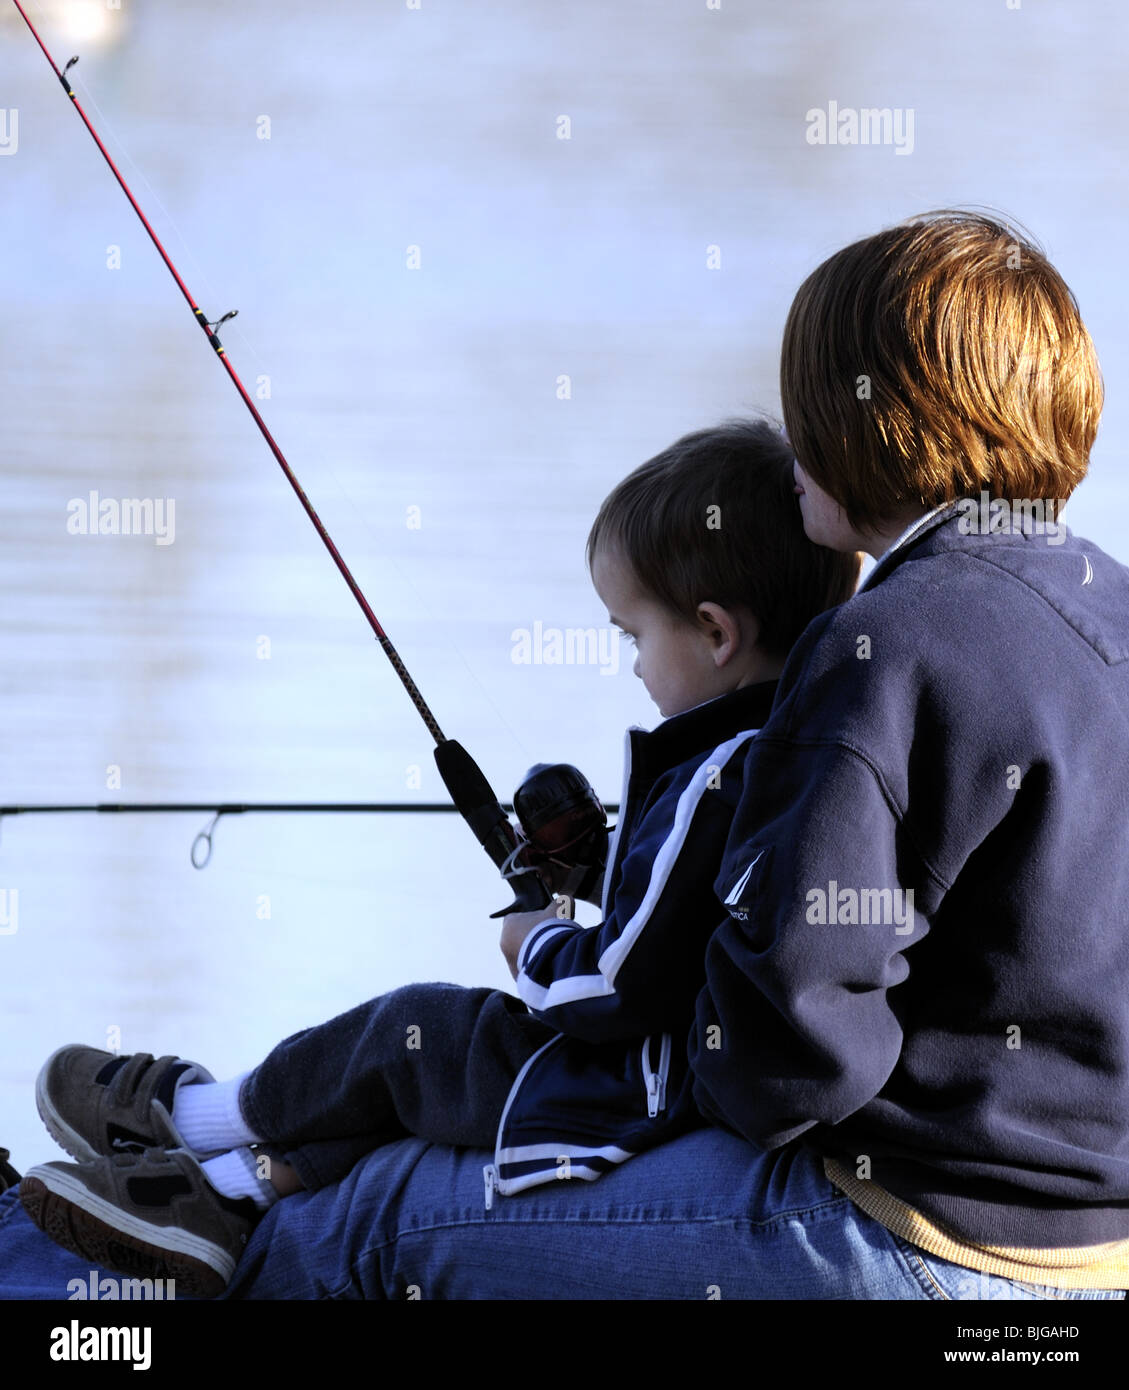 Mom & Son Fishing - Stock Image